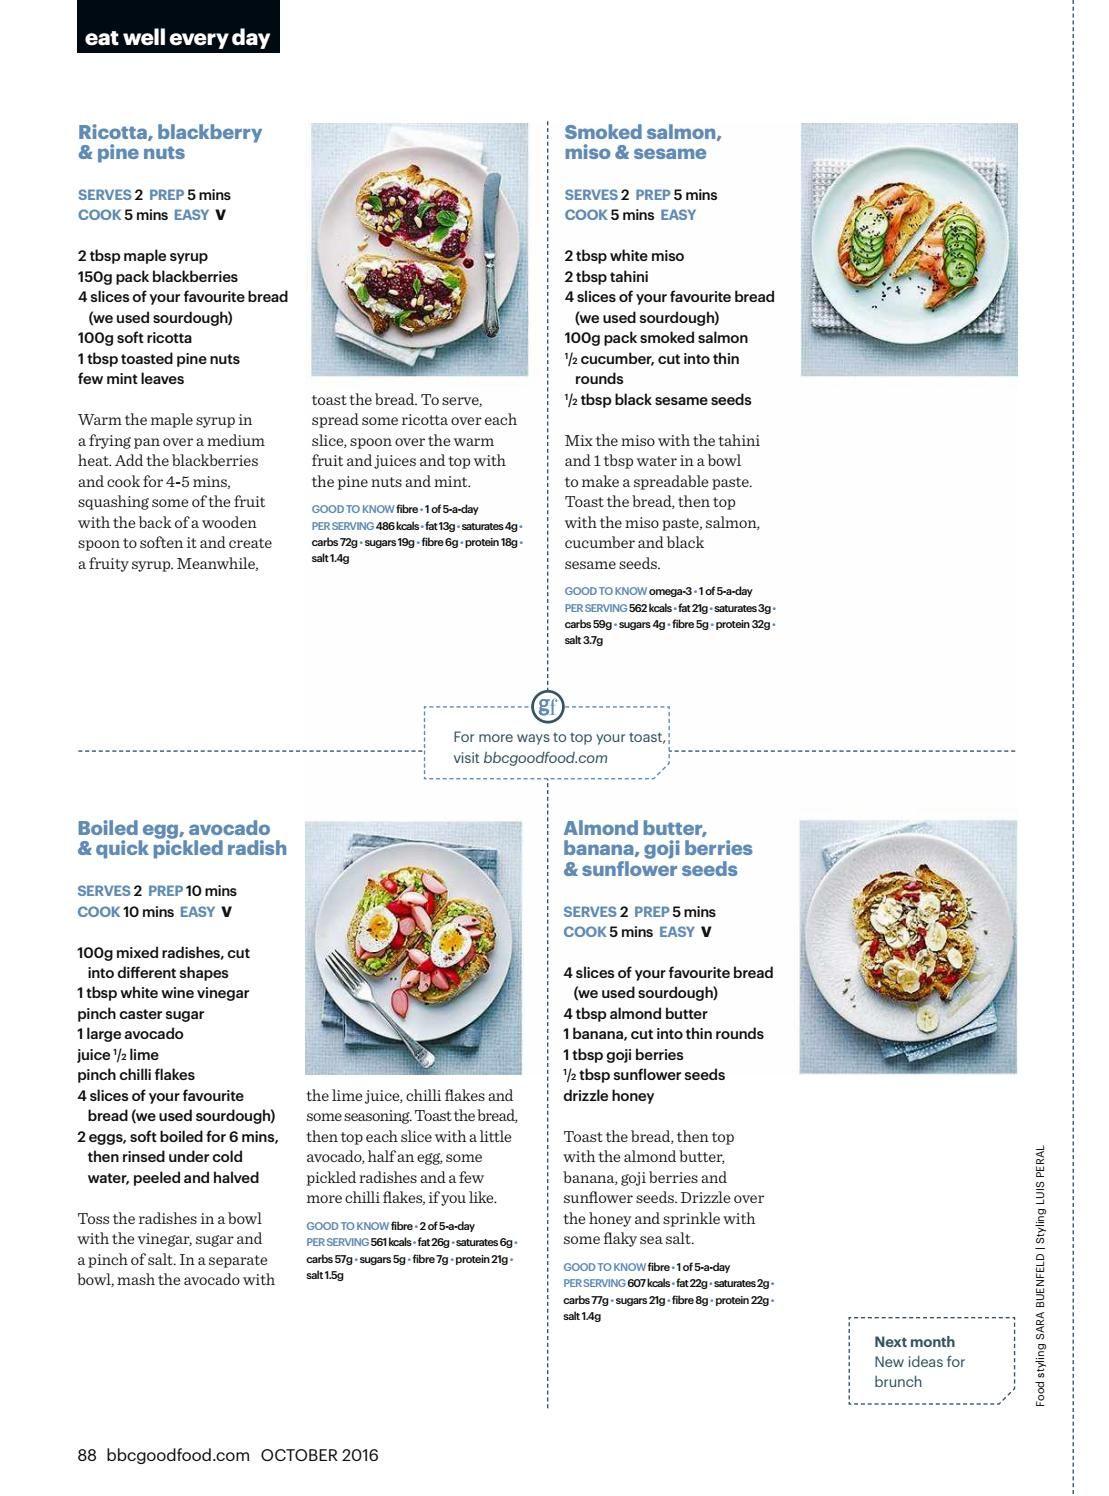 BBC good food (UK) Oct 2016 by min-mag.com - issuu